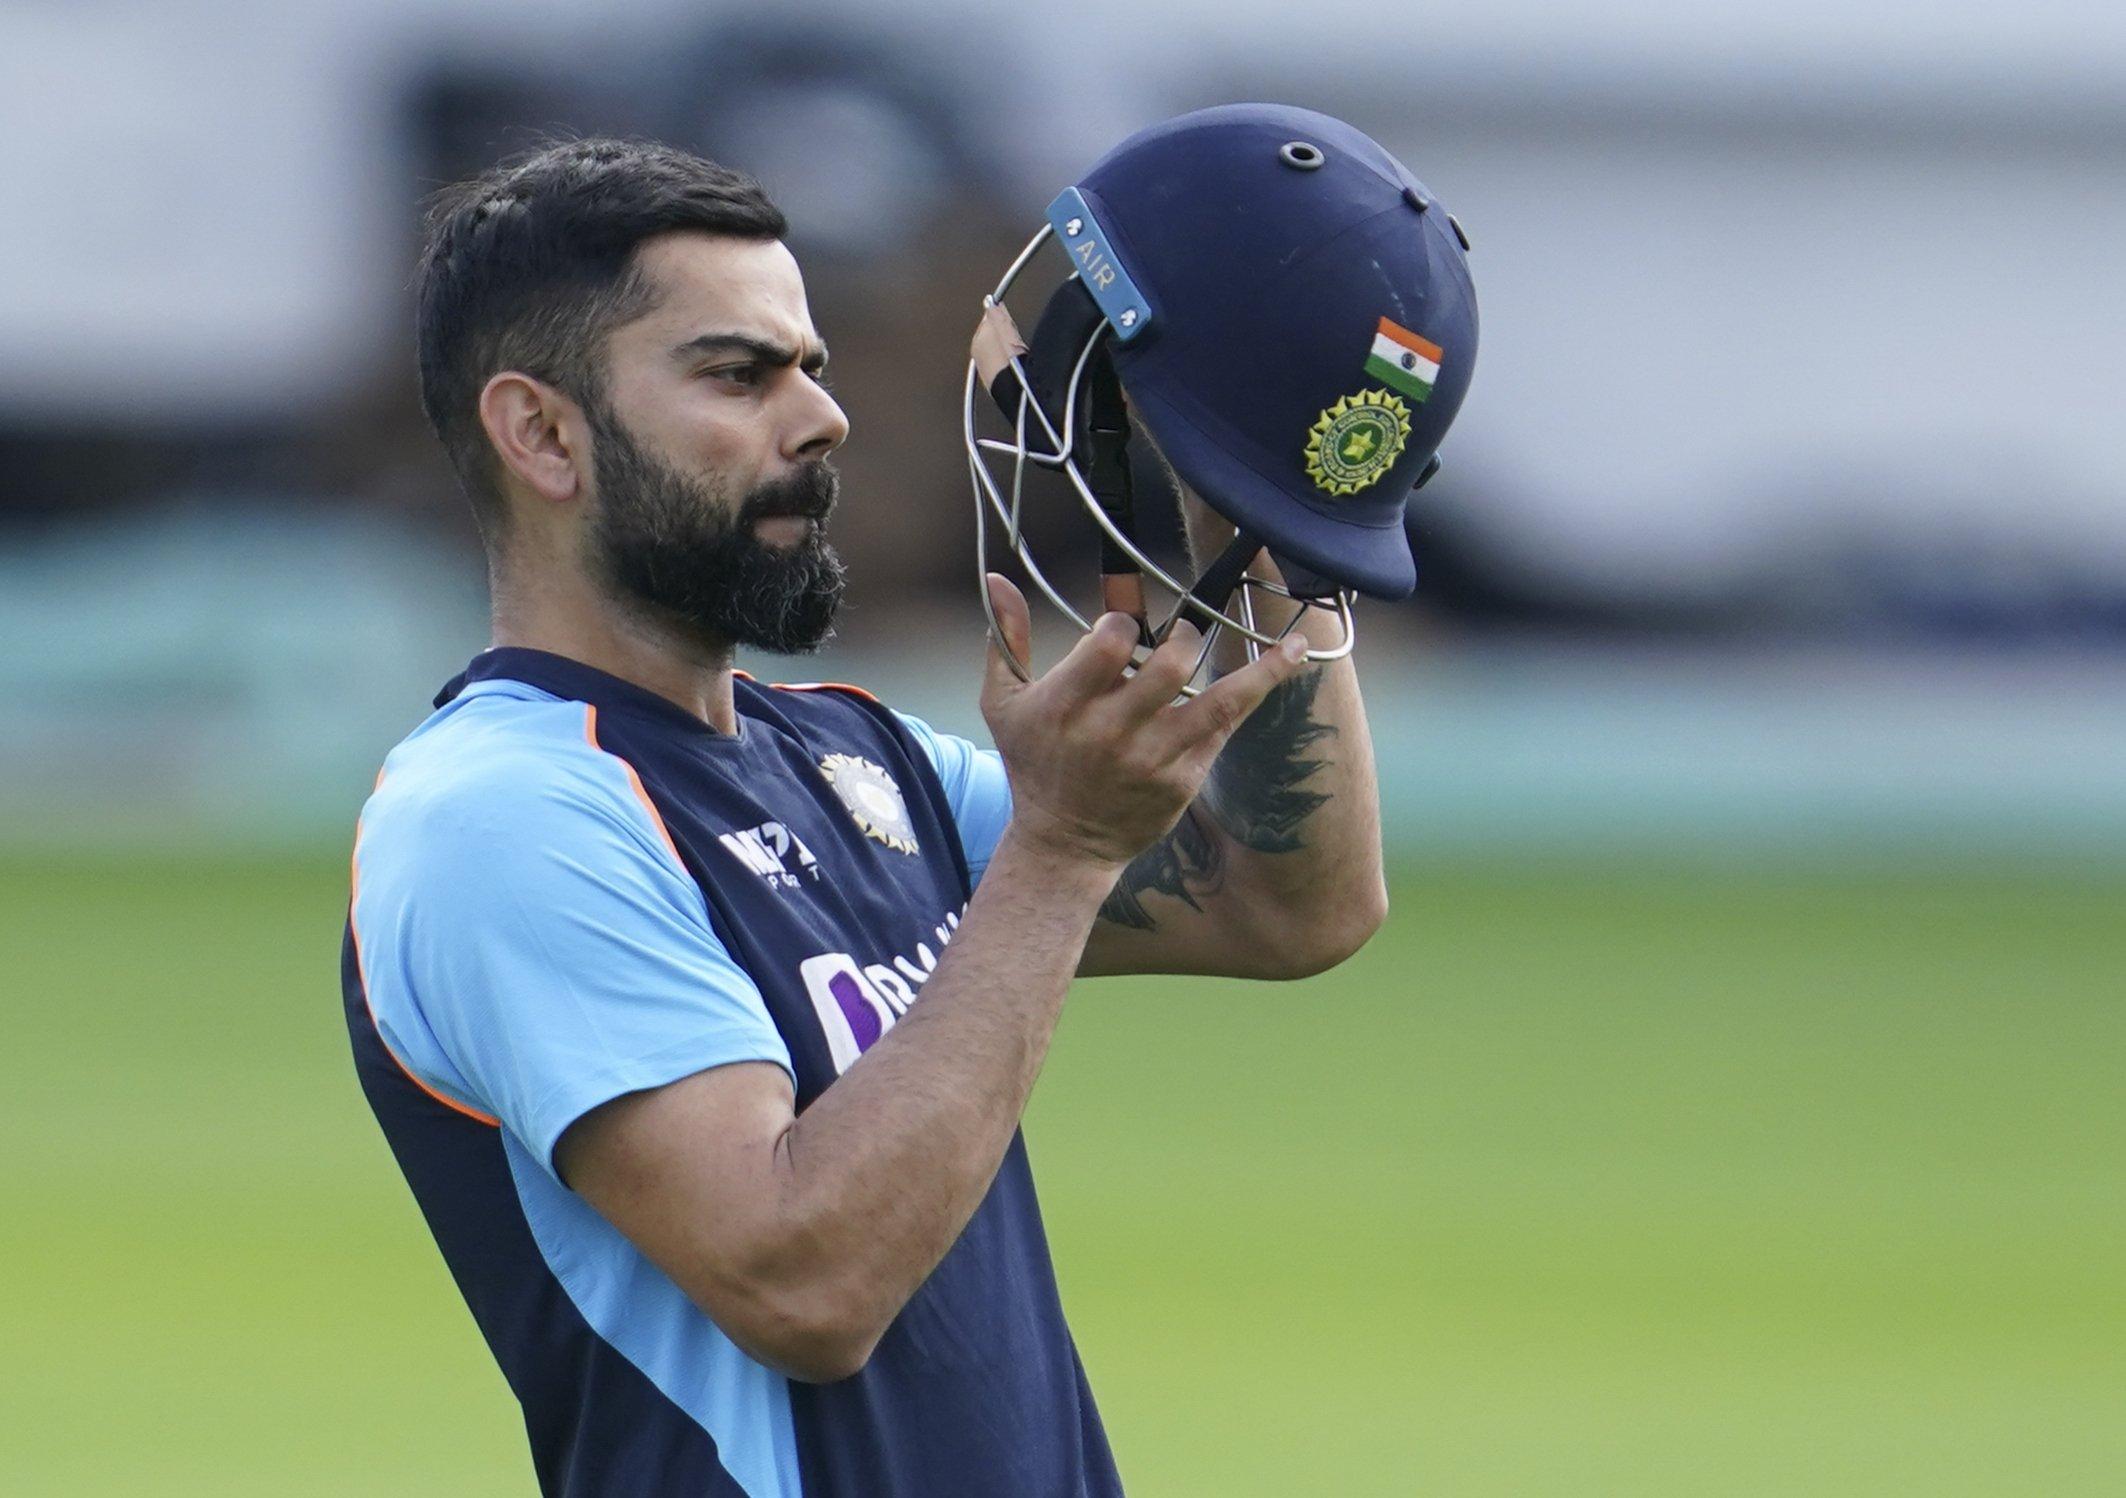 India captain Virat Kohli prepares to bat during a nets session at Headingley cricket ground in Leeds, England, Aug. 23, 2021. (AP Photo)